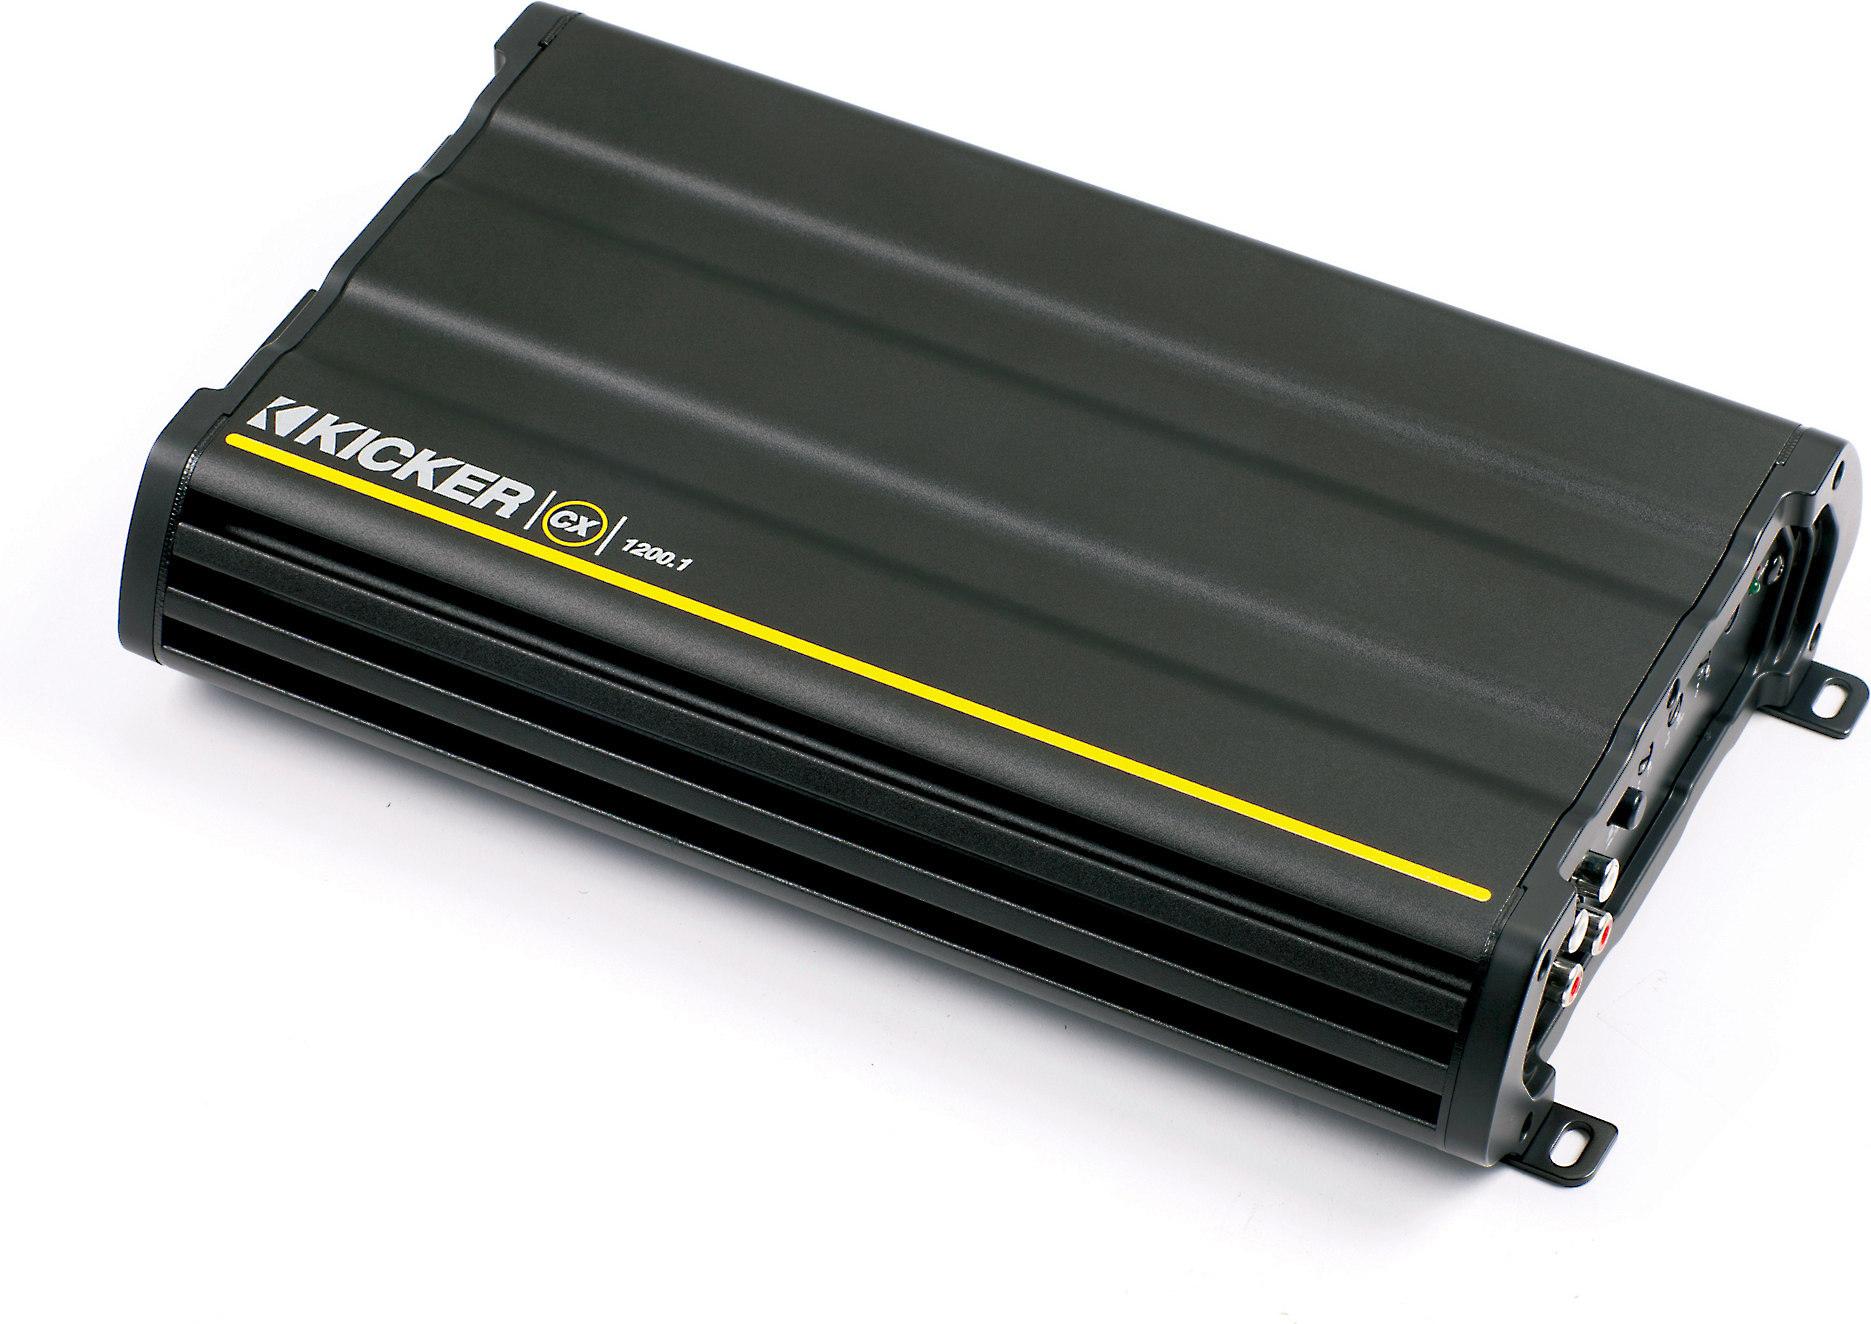 kicker 12cx1200 1 mono subwoofer amplifier — 1200 watts rms x 1 at 2 ohms  at crutchfield